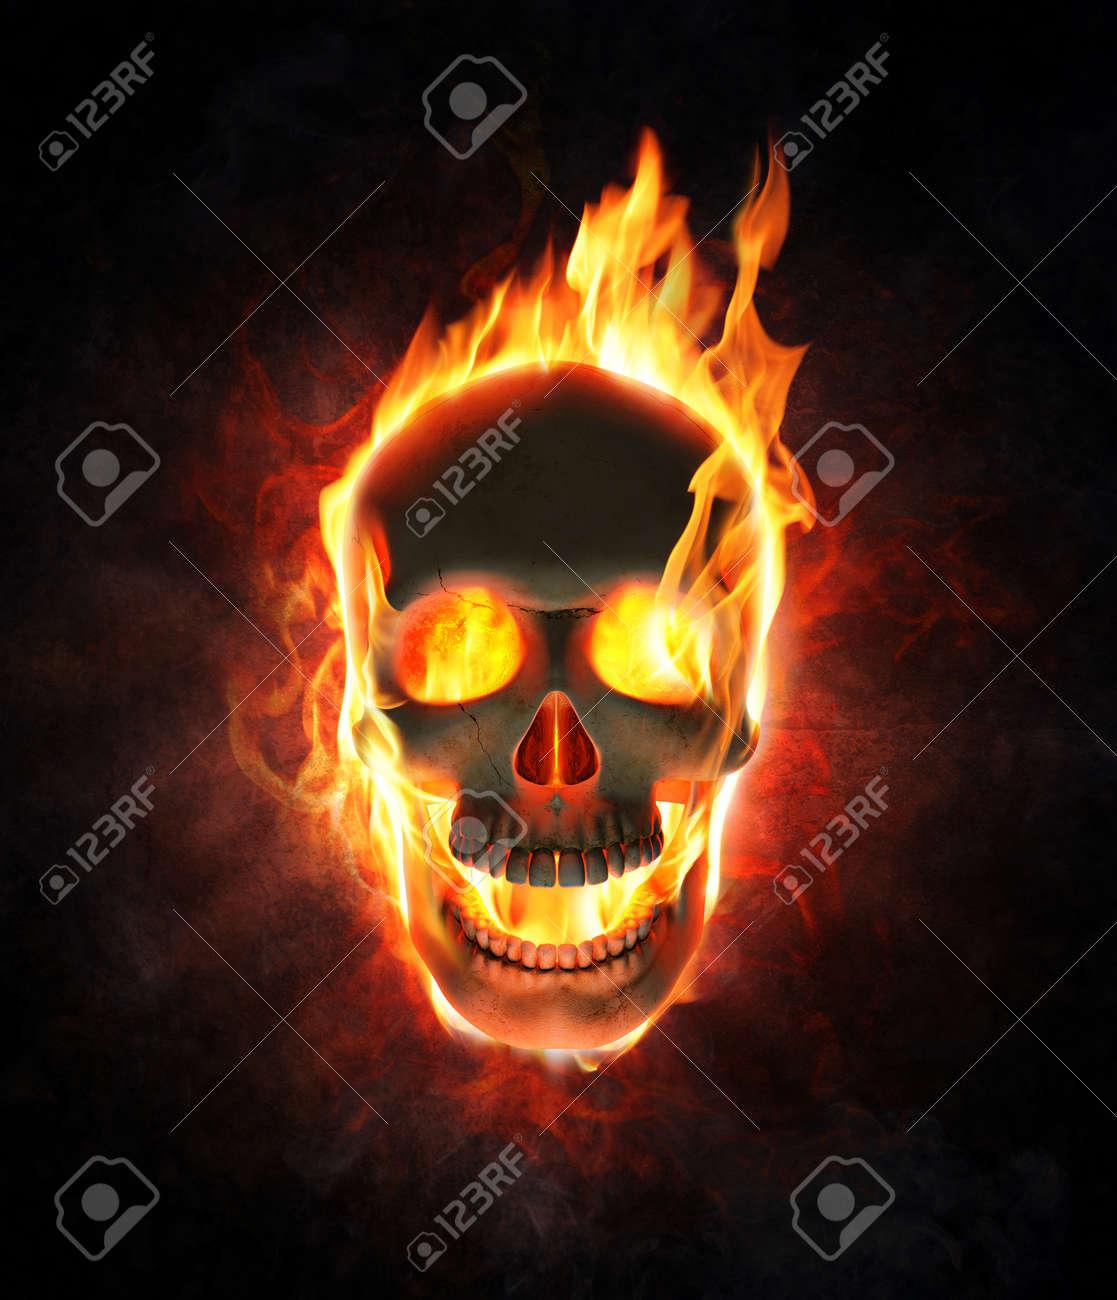 Inferno Em Chamas Simple crânio mau ardendo em chamas -, 3d, render foto royalty free